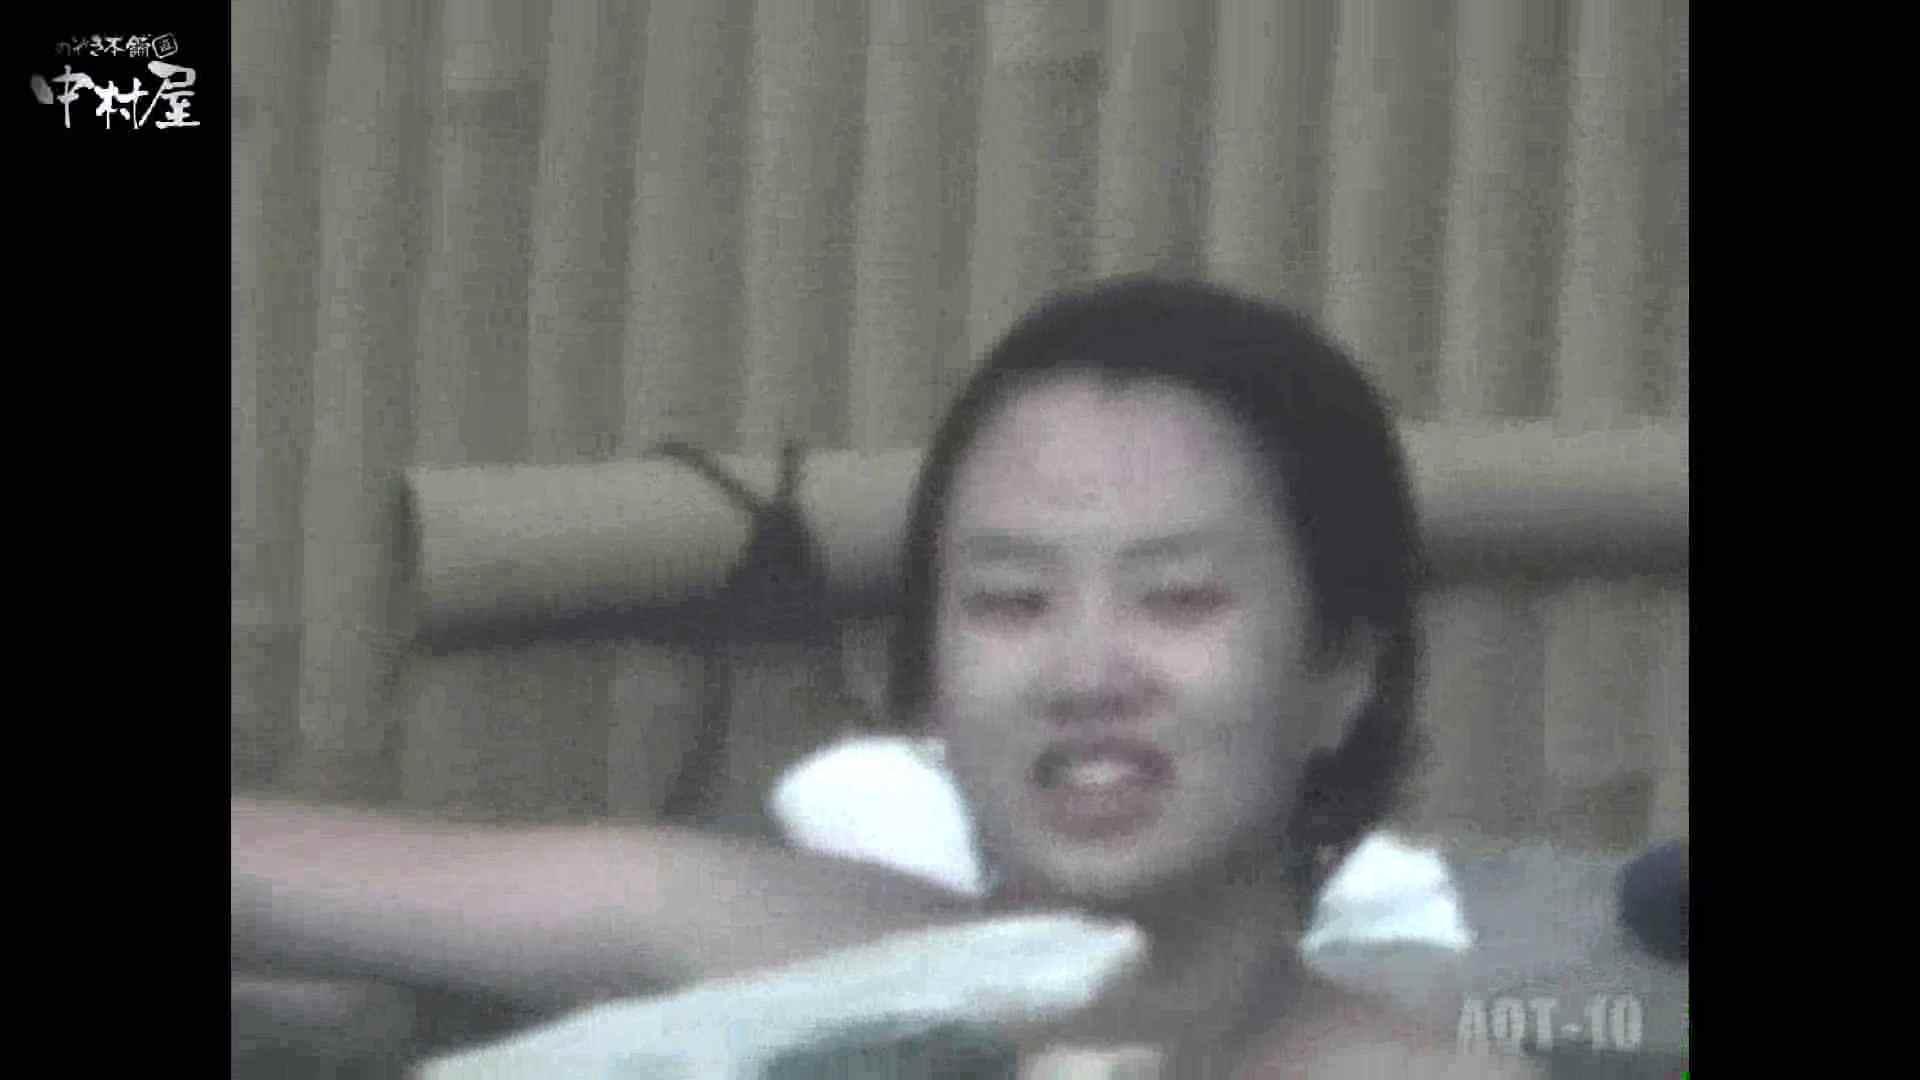 Aquaな露天風呂Vol.874潜入盗撮露天風呂十判湯 其の二 潜入突撃 オマンコ動画キャプチャ 90pic 55